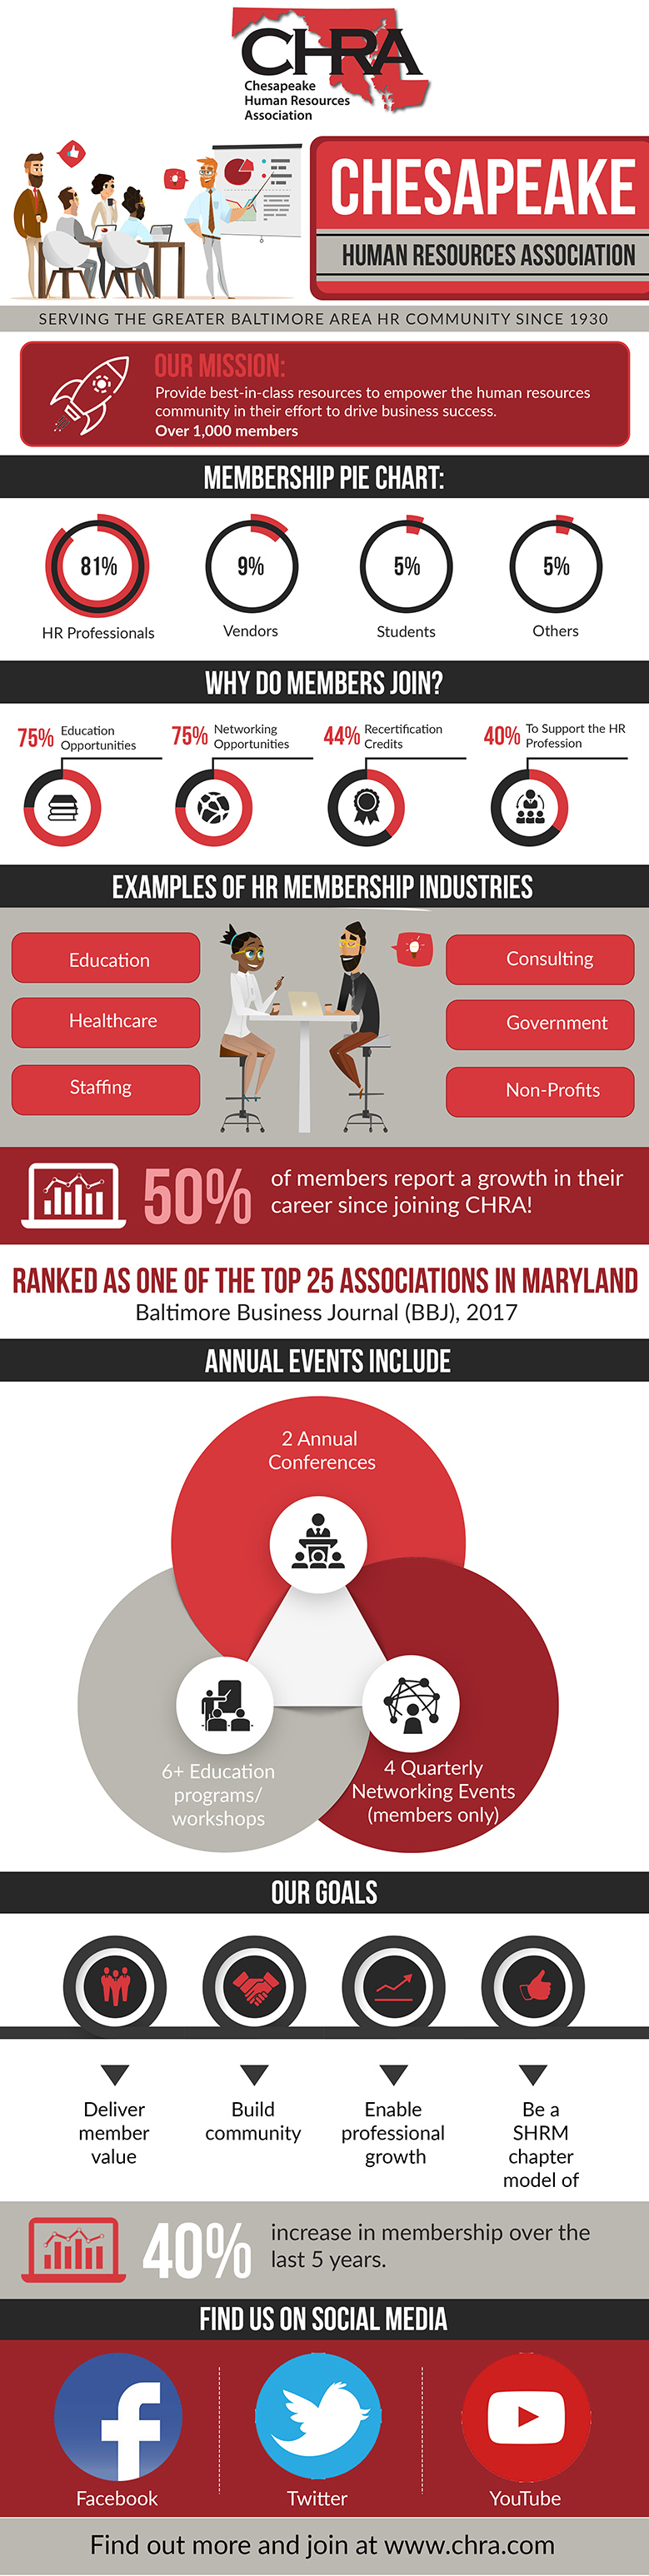 Newsletter - Chesapeake Human Resources Association